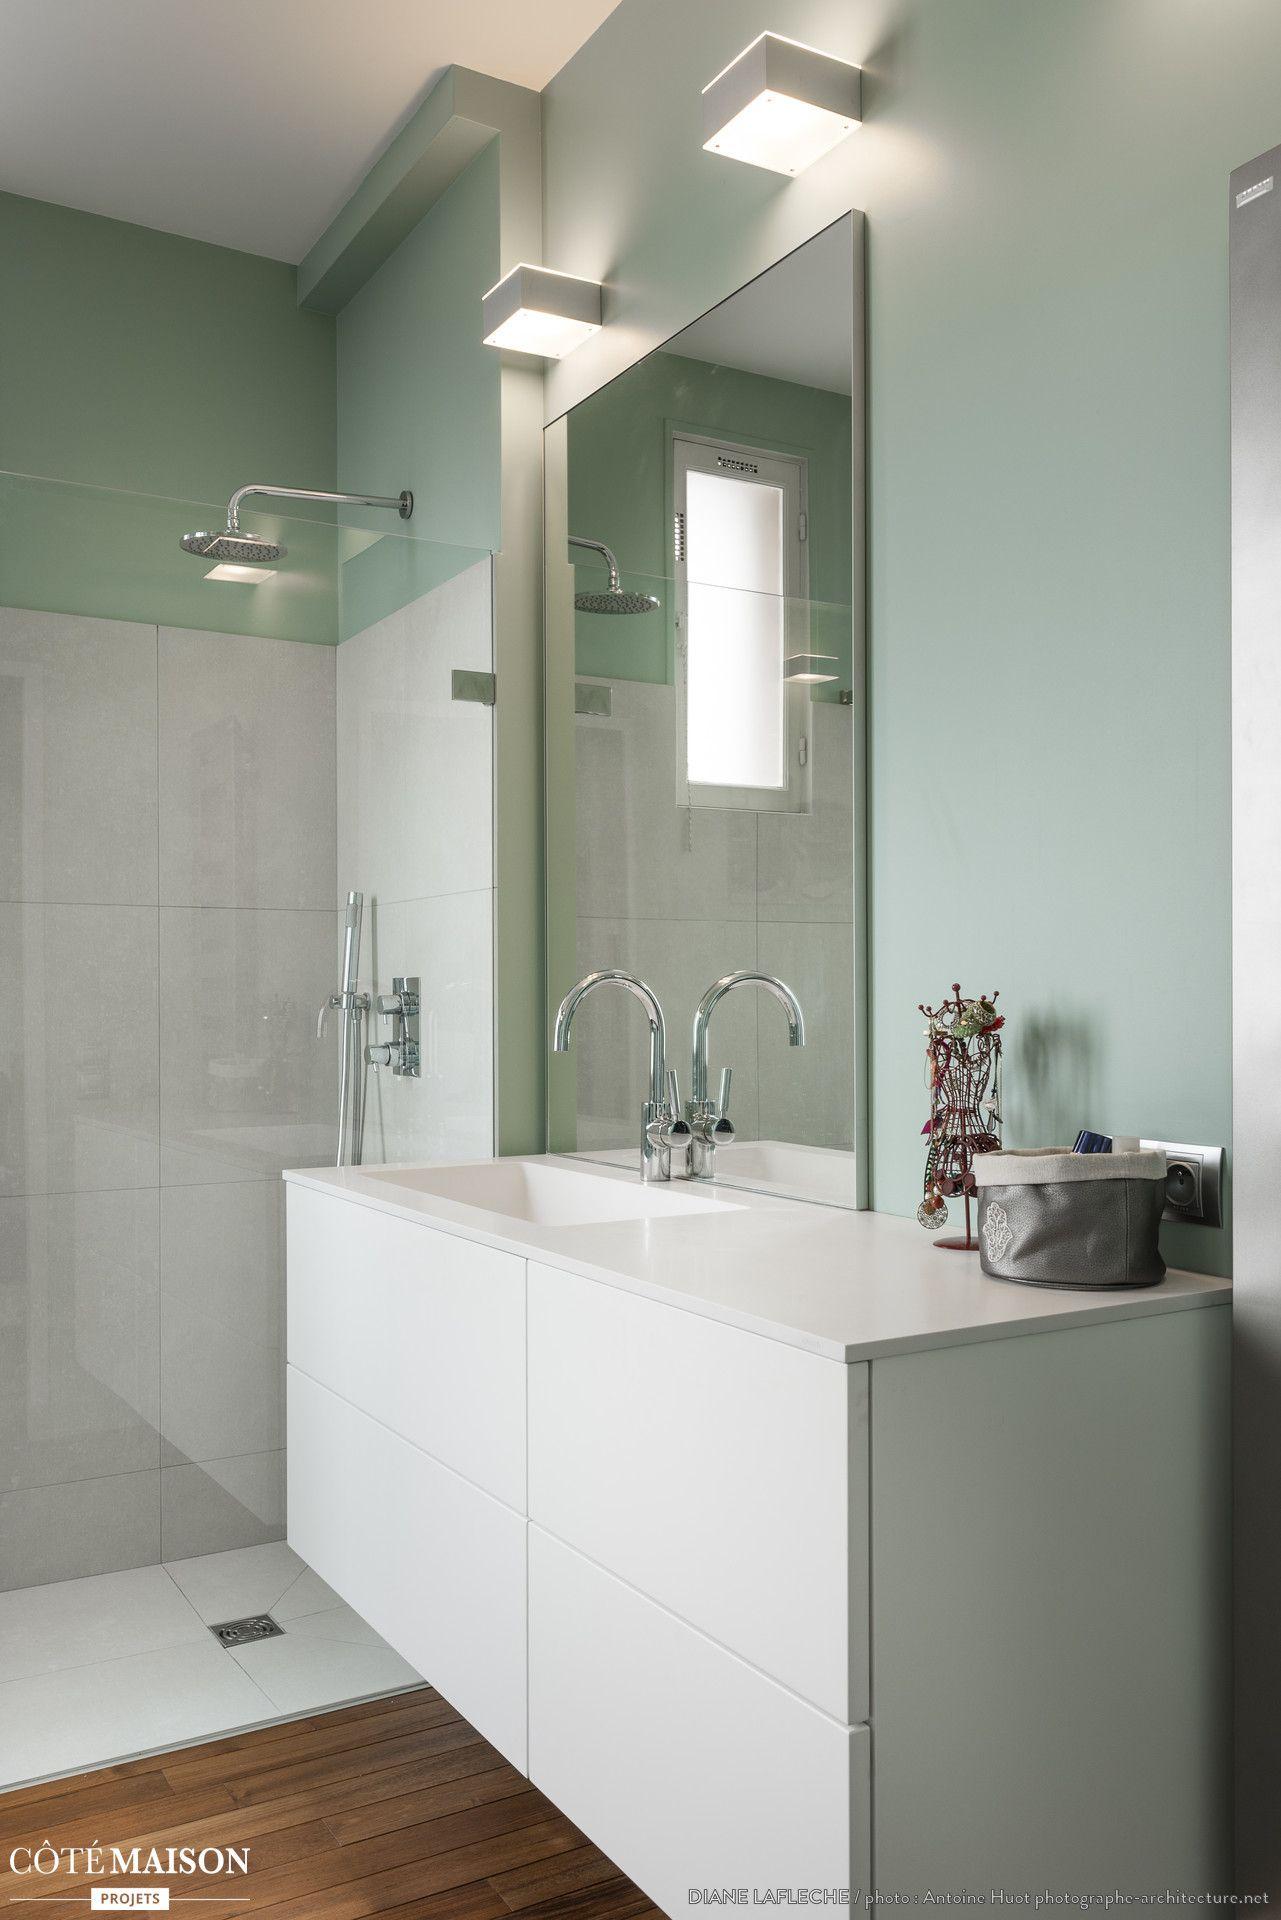 Salle De Bain Miniature ~ pin by c line dufresne on salle de bain bathroom pinterest